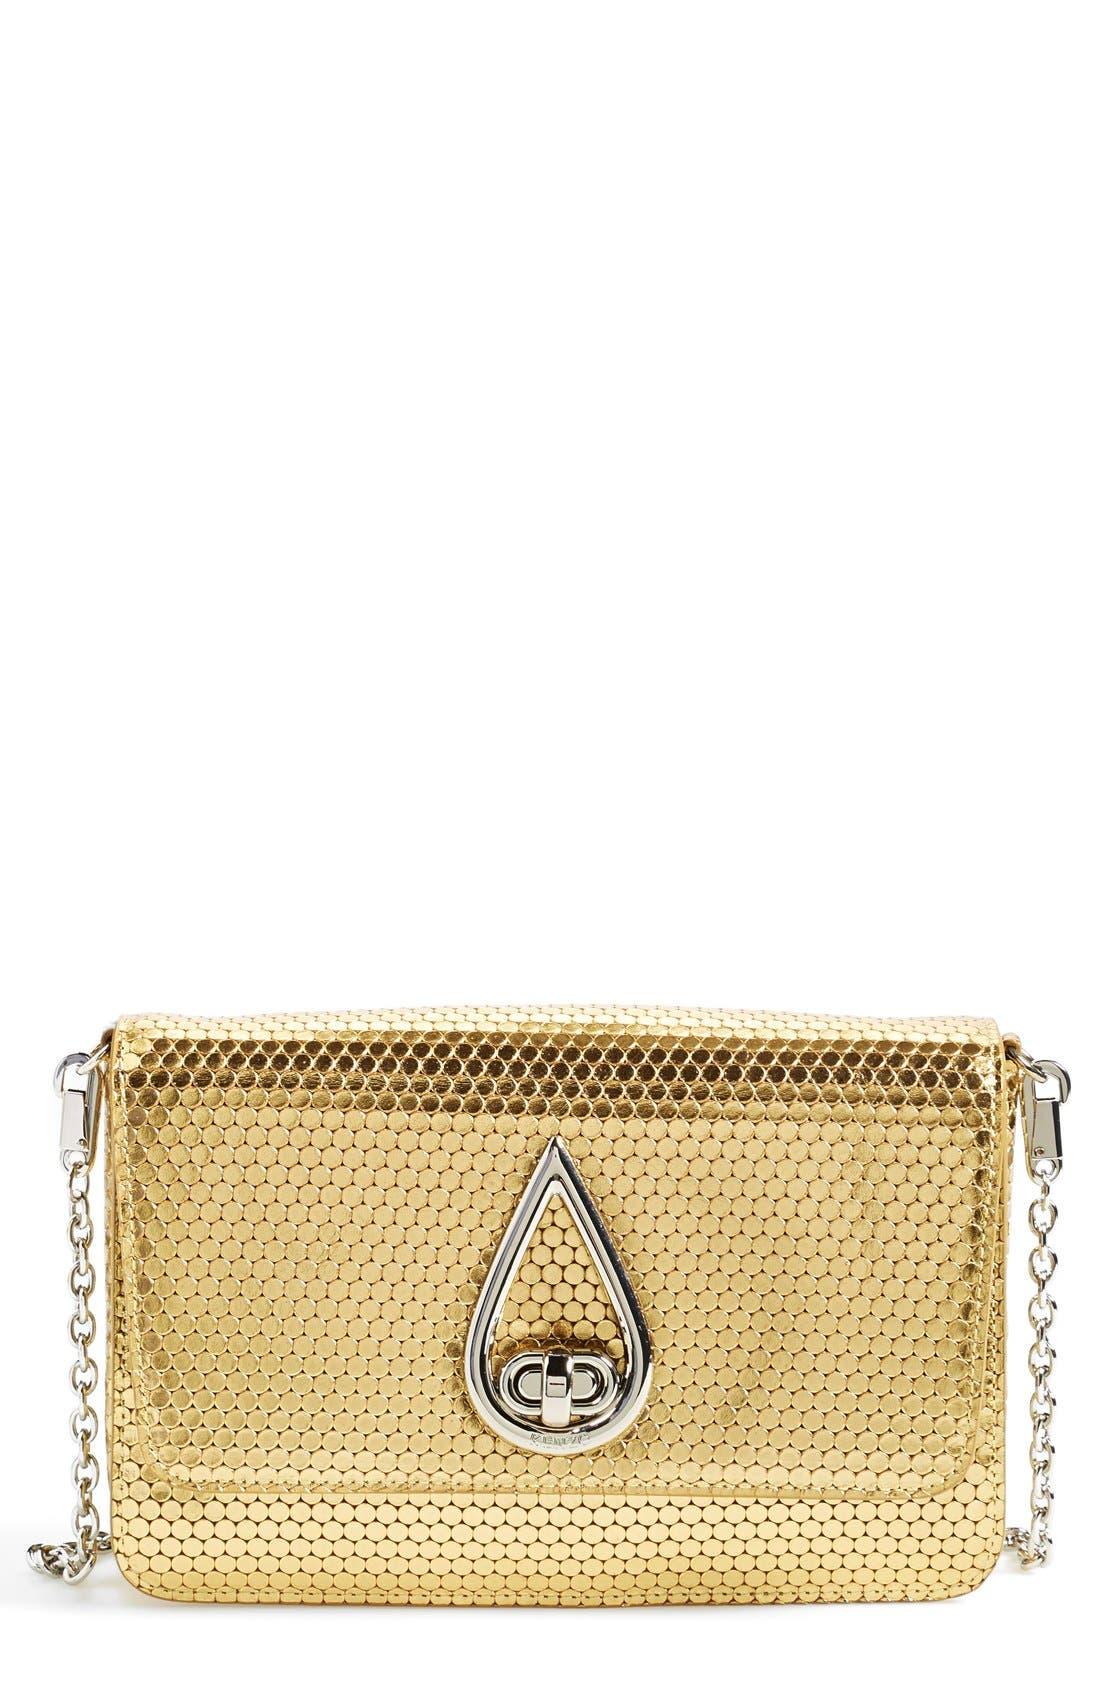 Alternate Image 1 Selected - KENZO 'Raindrop' Metallic Leather Shoulder Bag